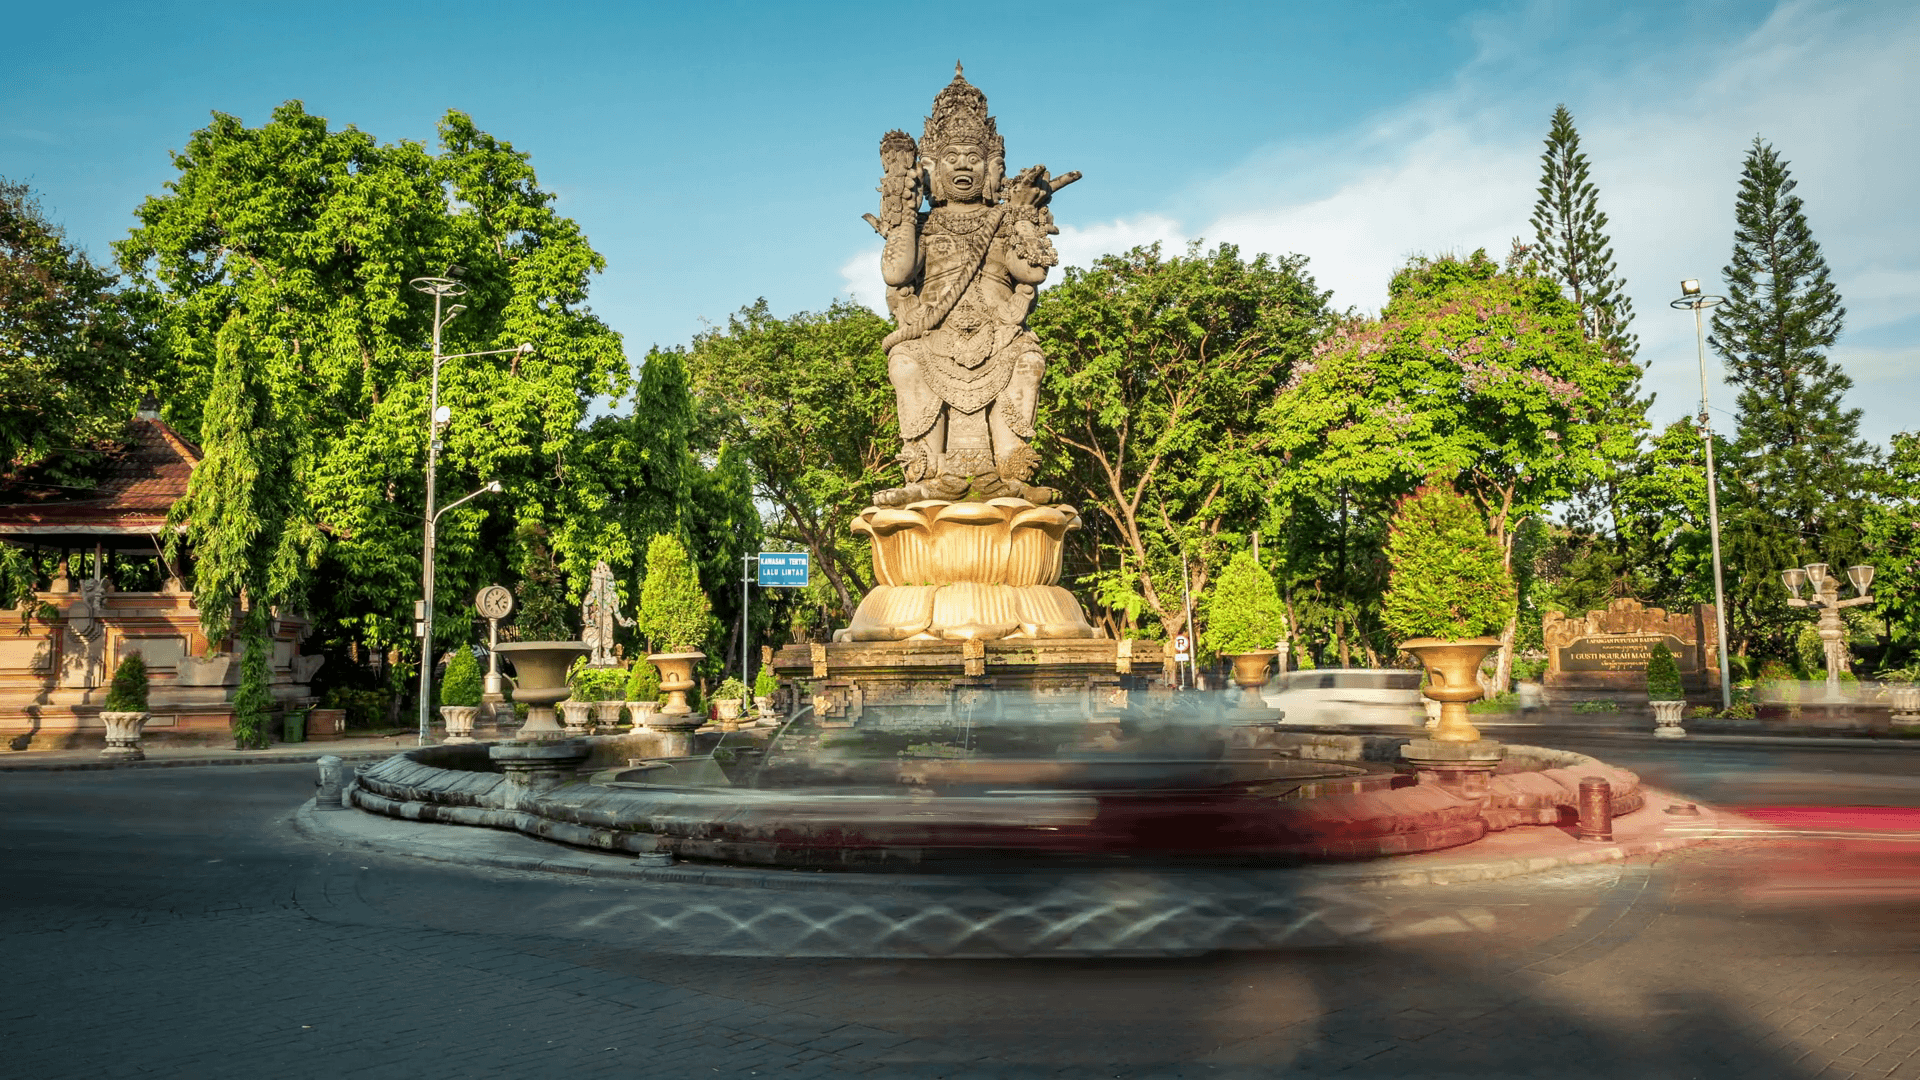 Cтатуя Катур Мука в Денпасаре